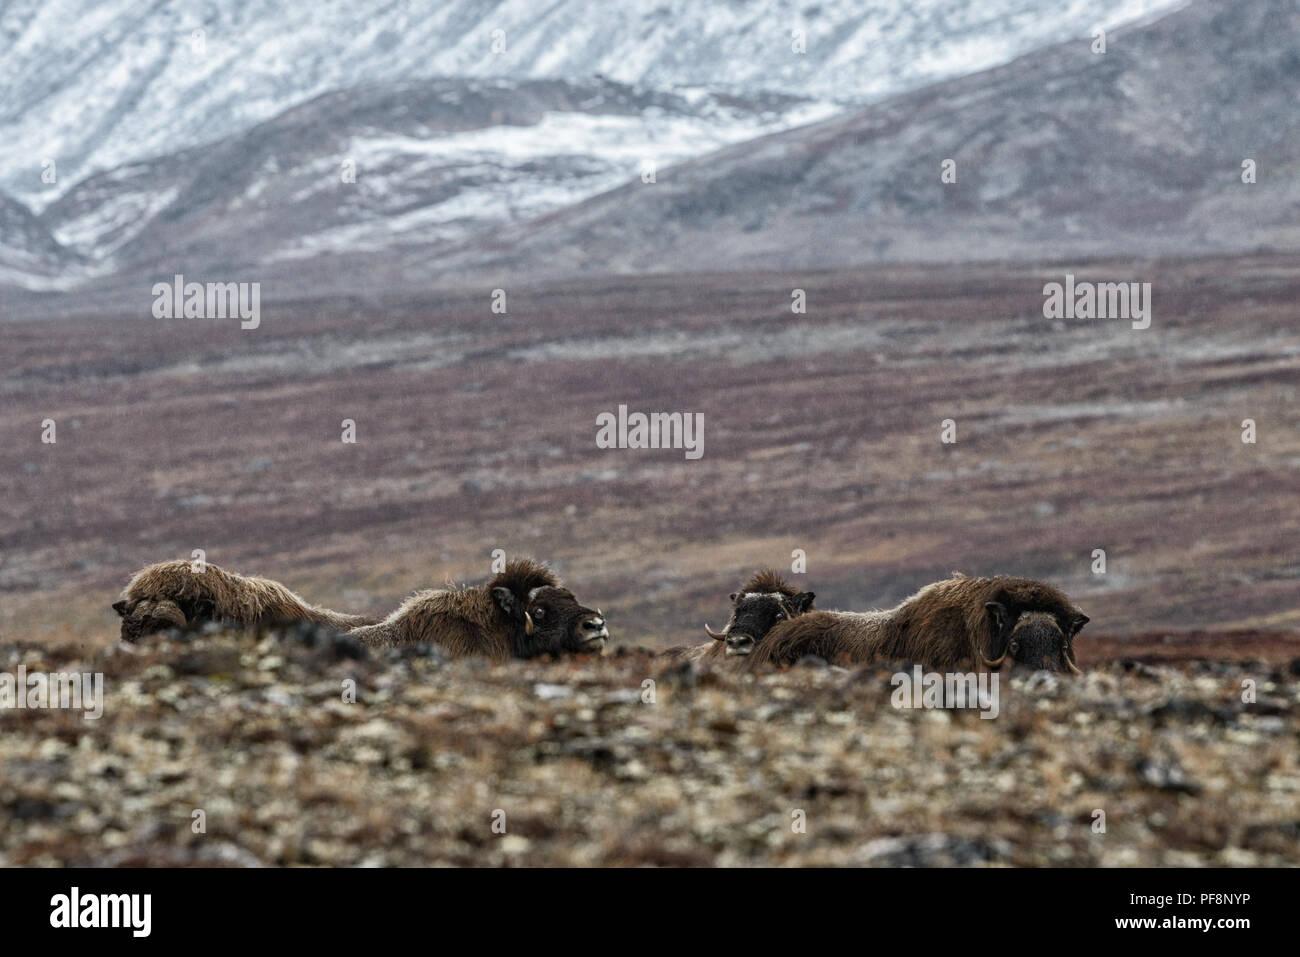 A group of muskoxen in autumn, Sydkap Jytte Havn, Scoresby Sund, Kangertittivaq, Greenland, 2017 - Stock Image